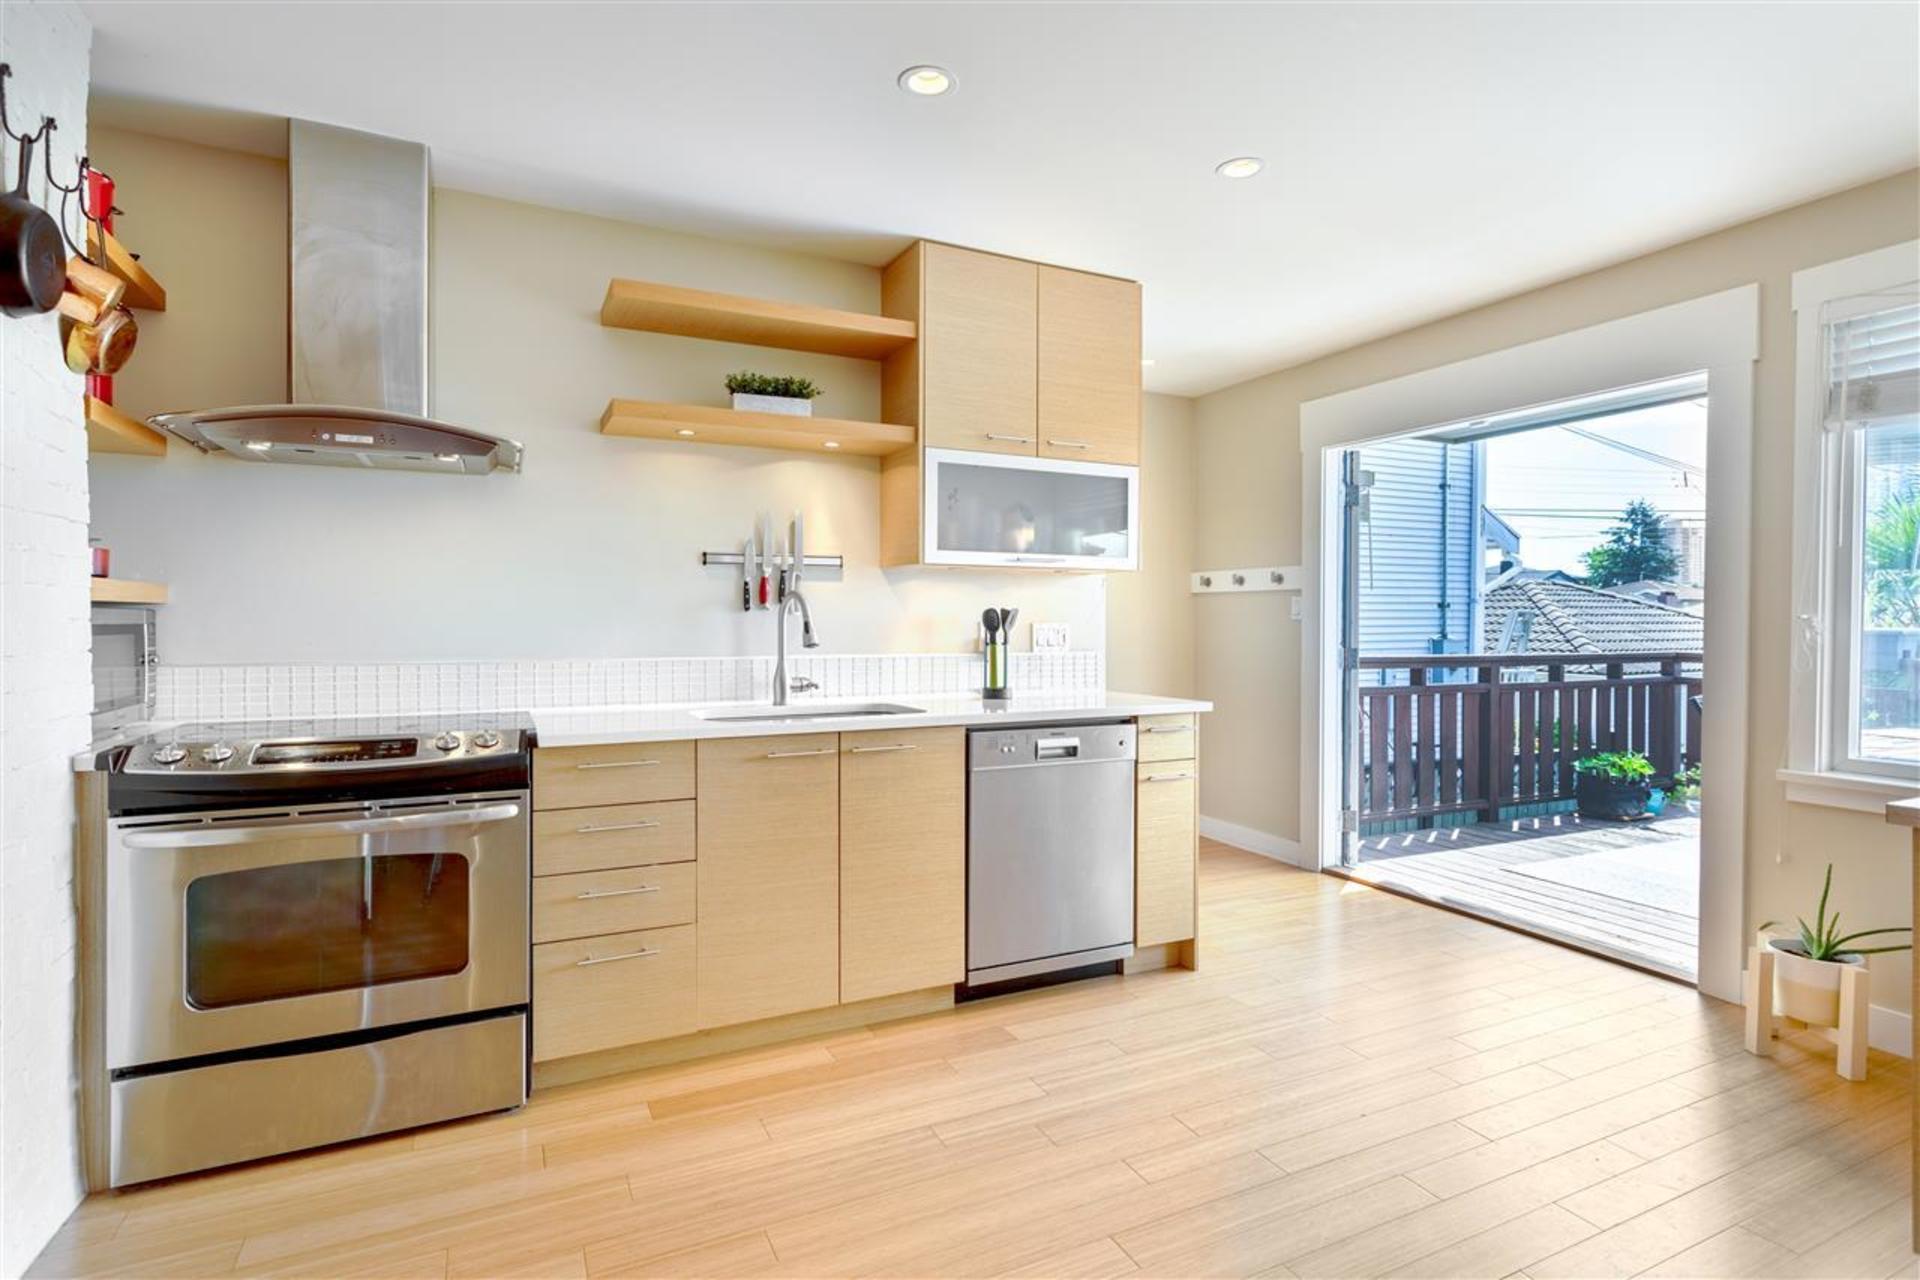 3912-parker-street-willingdon-heights-burnaby-north-05 at 3912 Parker Street, Willingdon Heights, Burnaby North